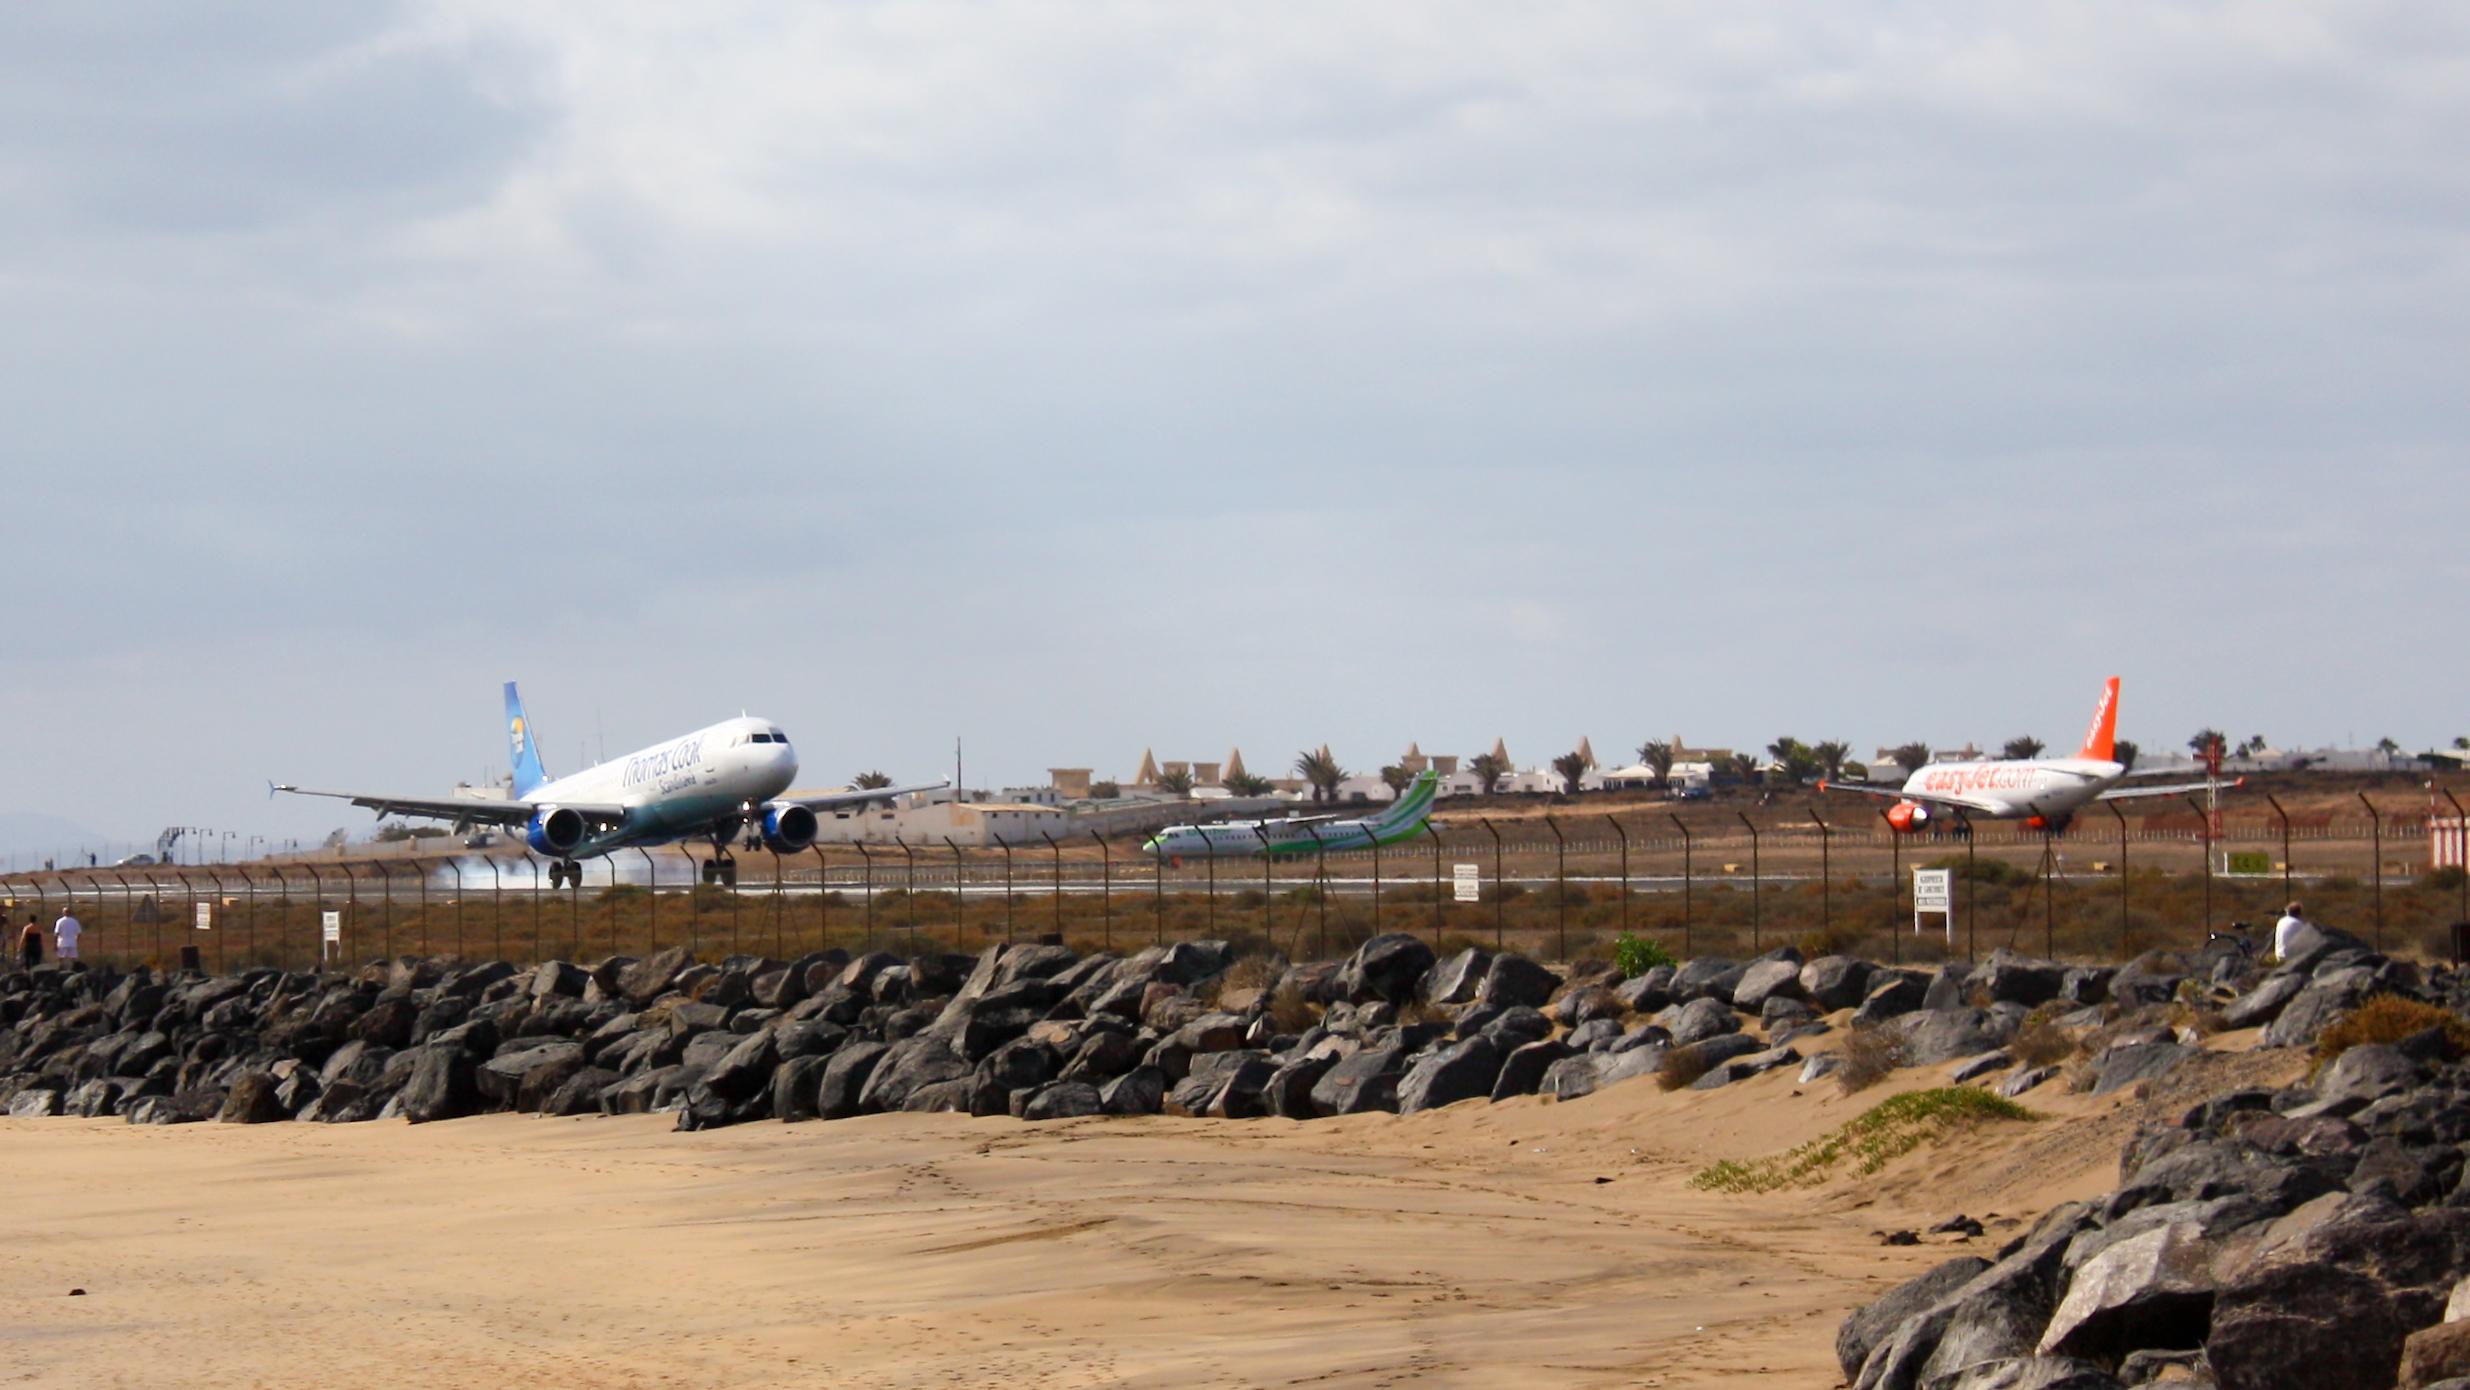 Bildresultat för lanzarote airport